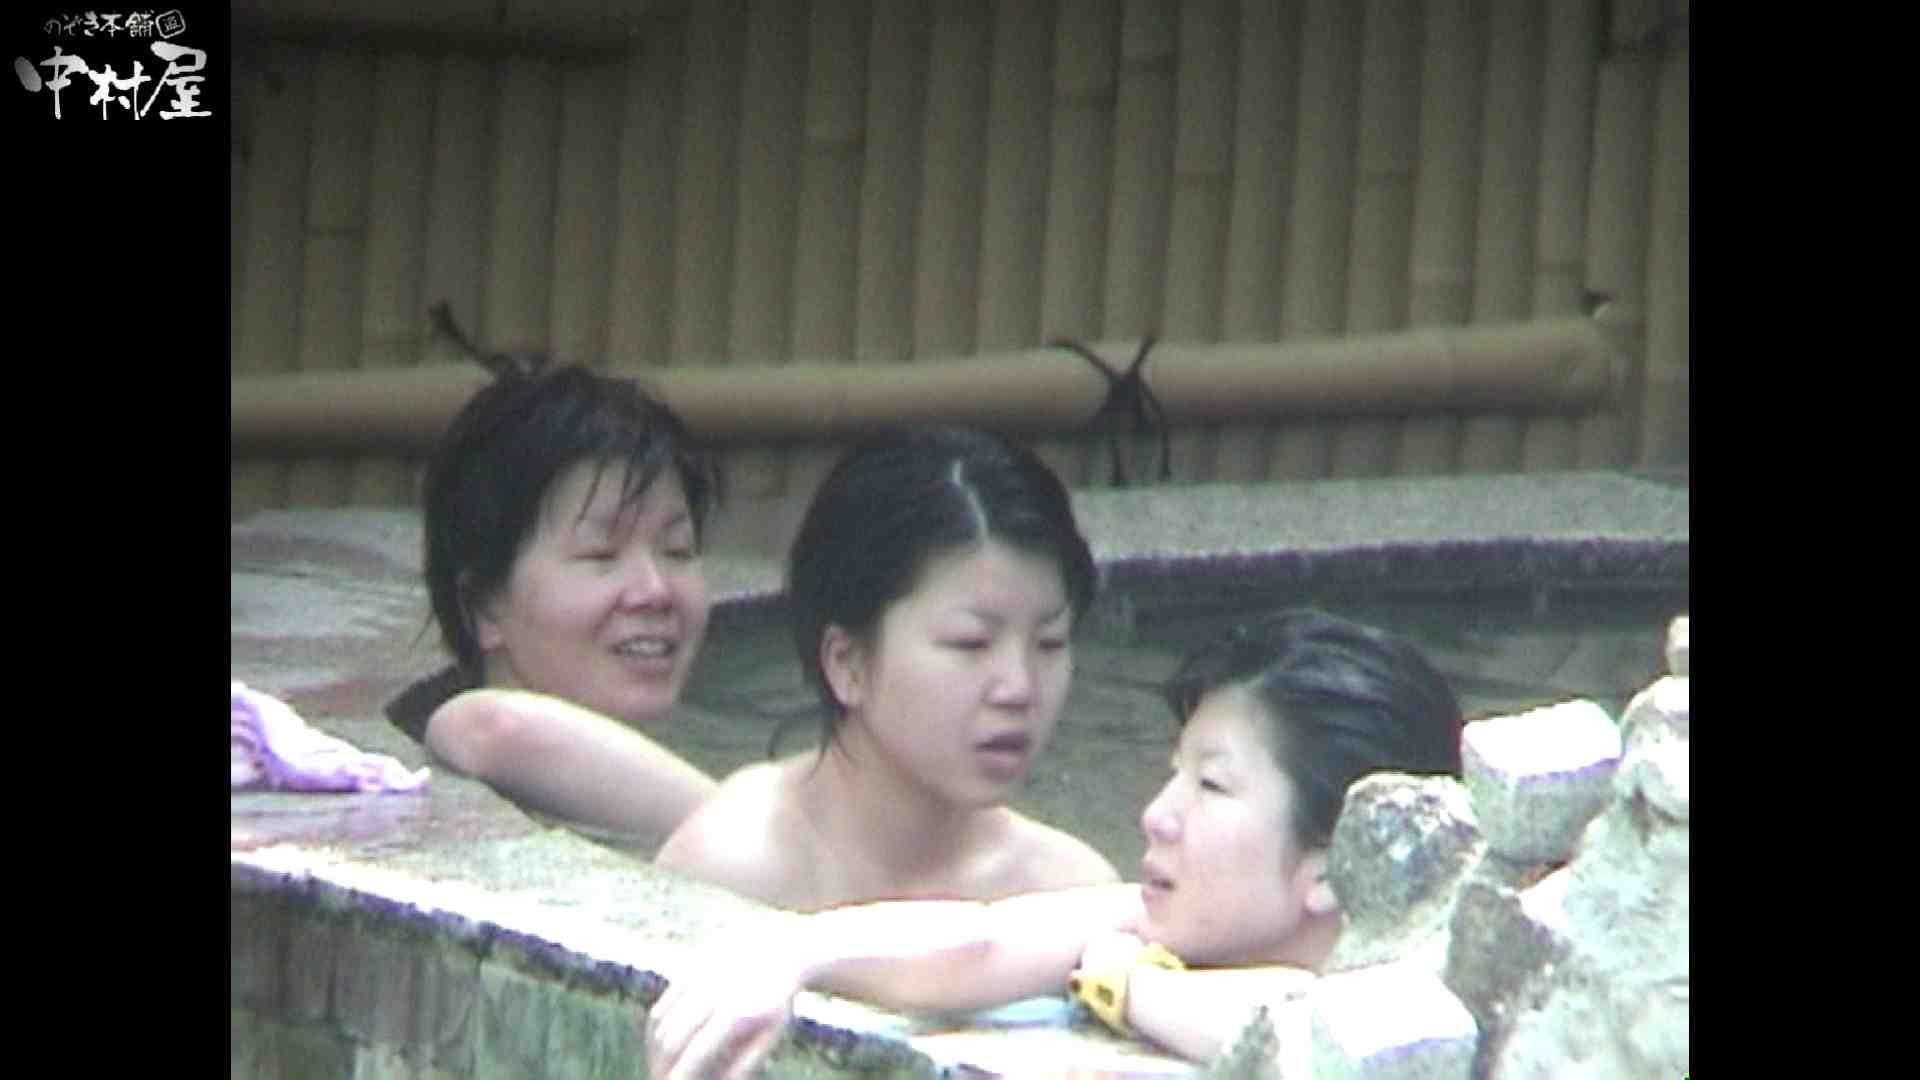 Aquaな露天風呂Vol.936 OLセックス 覗きぱこり動画紹介 75画像 41